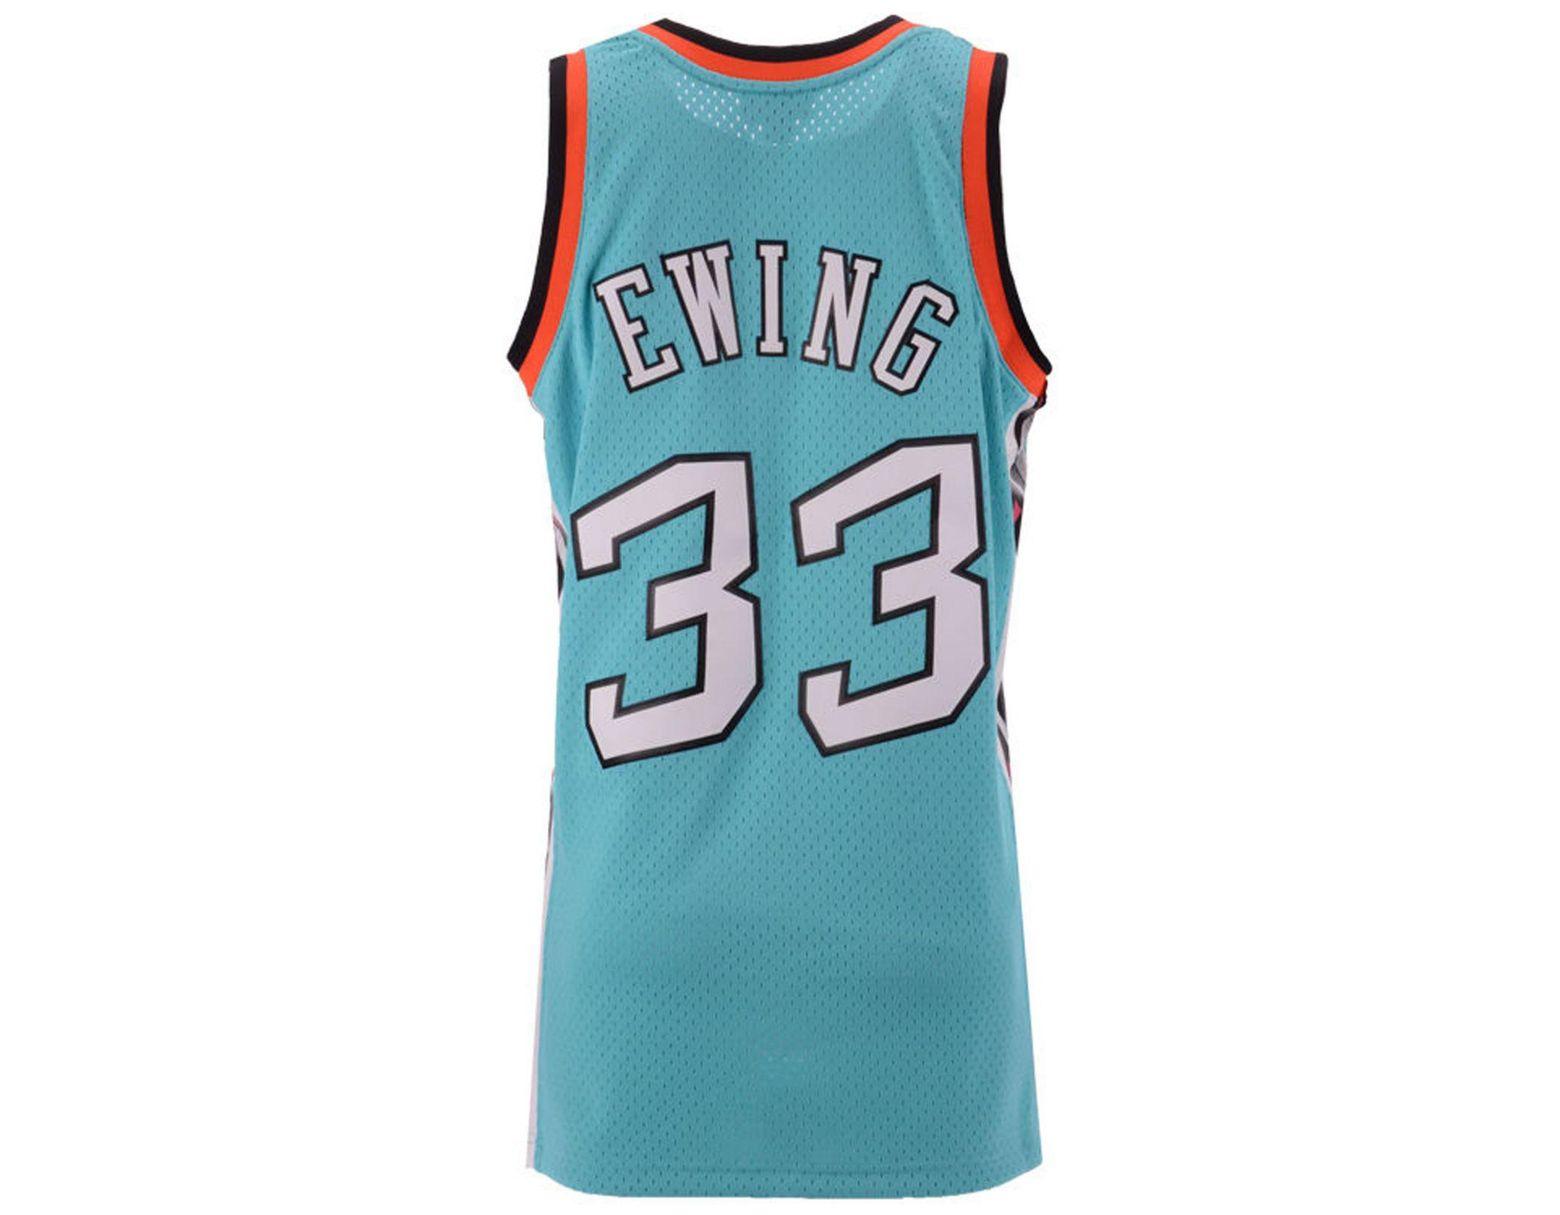 9227d1b02 Mitchell & Ness Patrick Ewing Nba All Star 1996 Swingman Jersey in Blue for  Men - Lyst